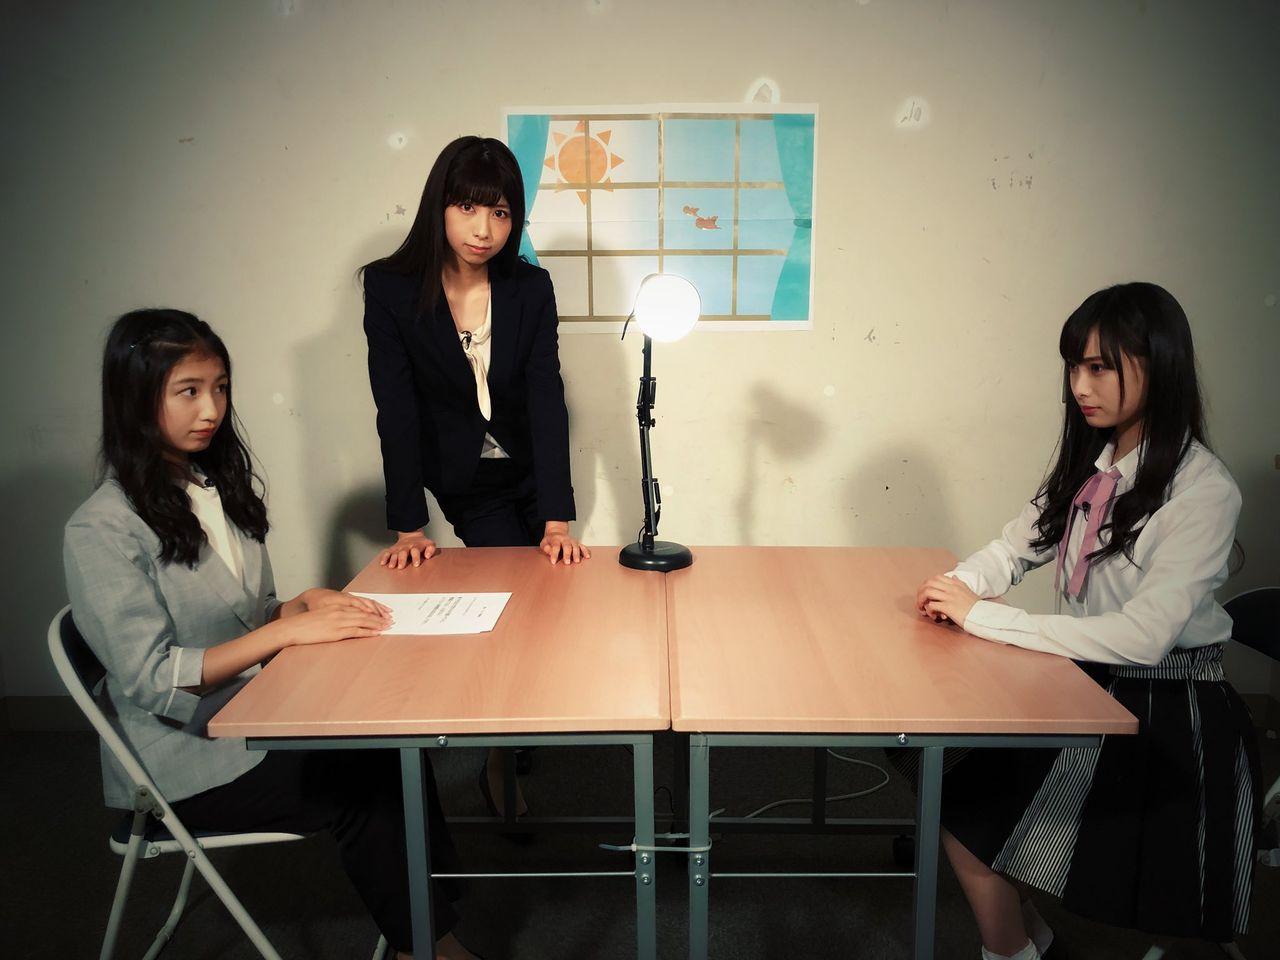 【NMB48】新YNNに新企画「ケイト取調室」きたーー【塩月希依音・鵜野みずき】